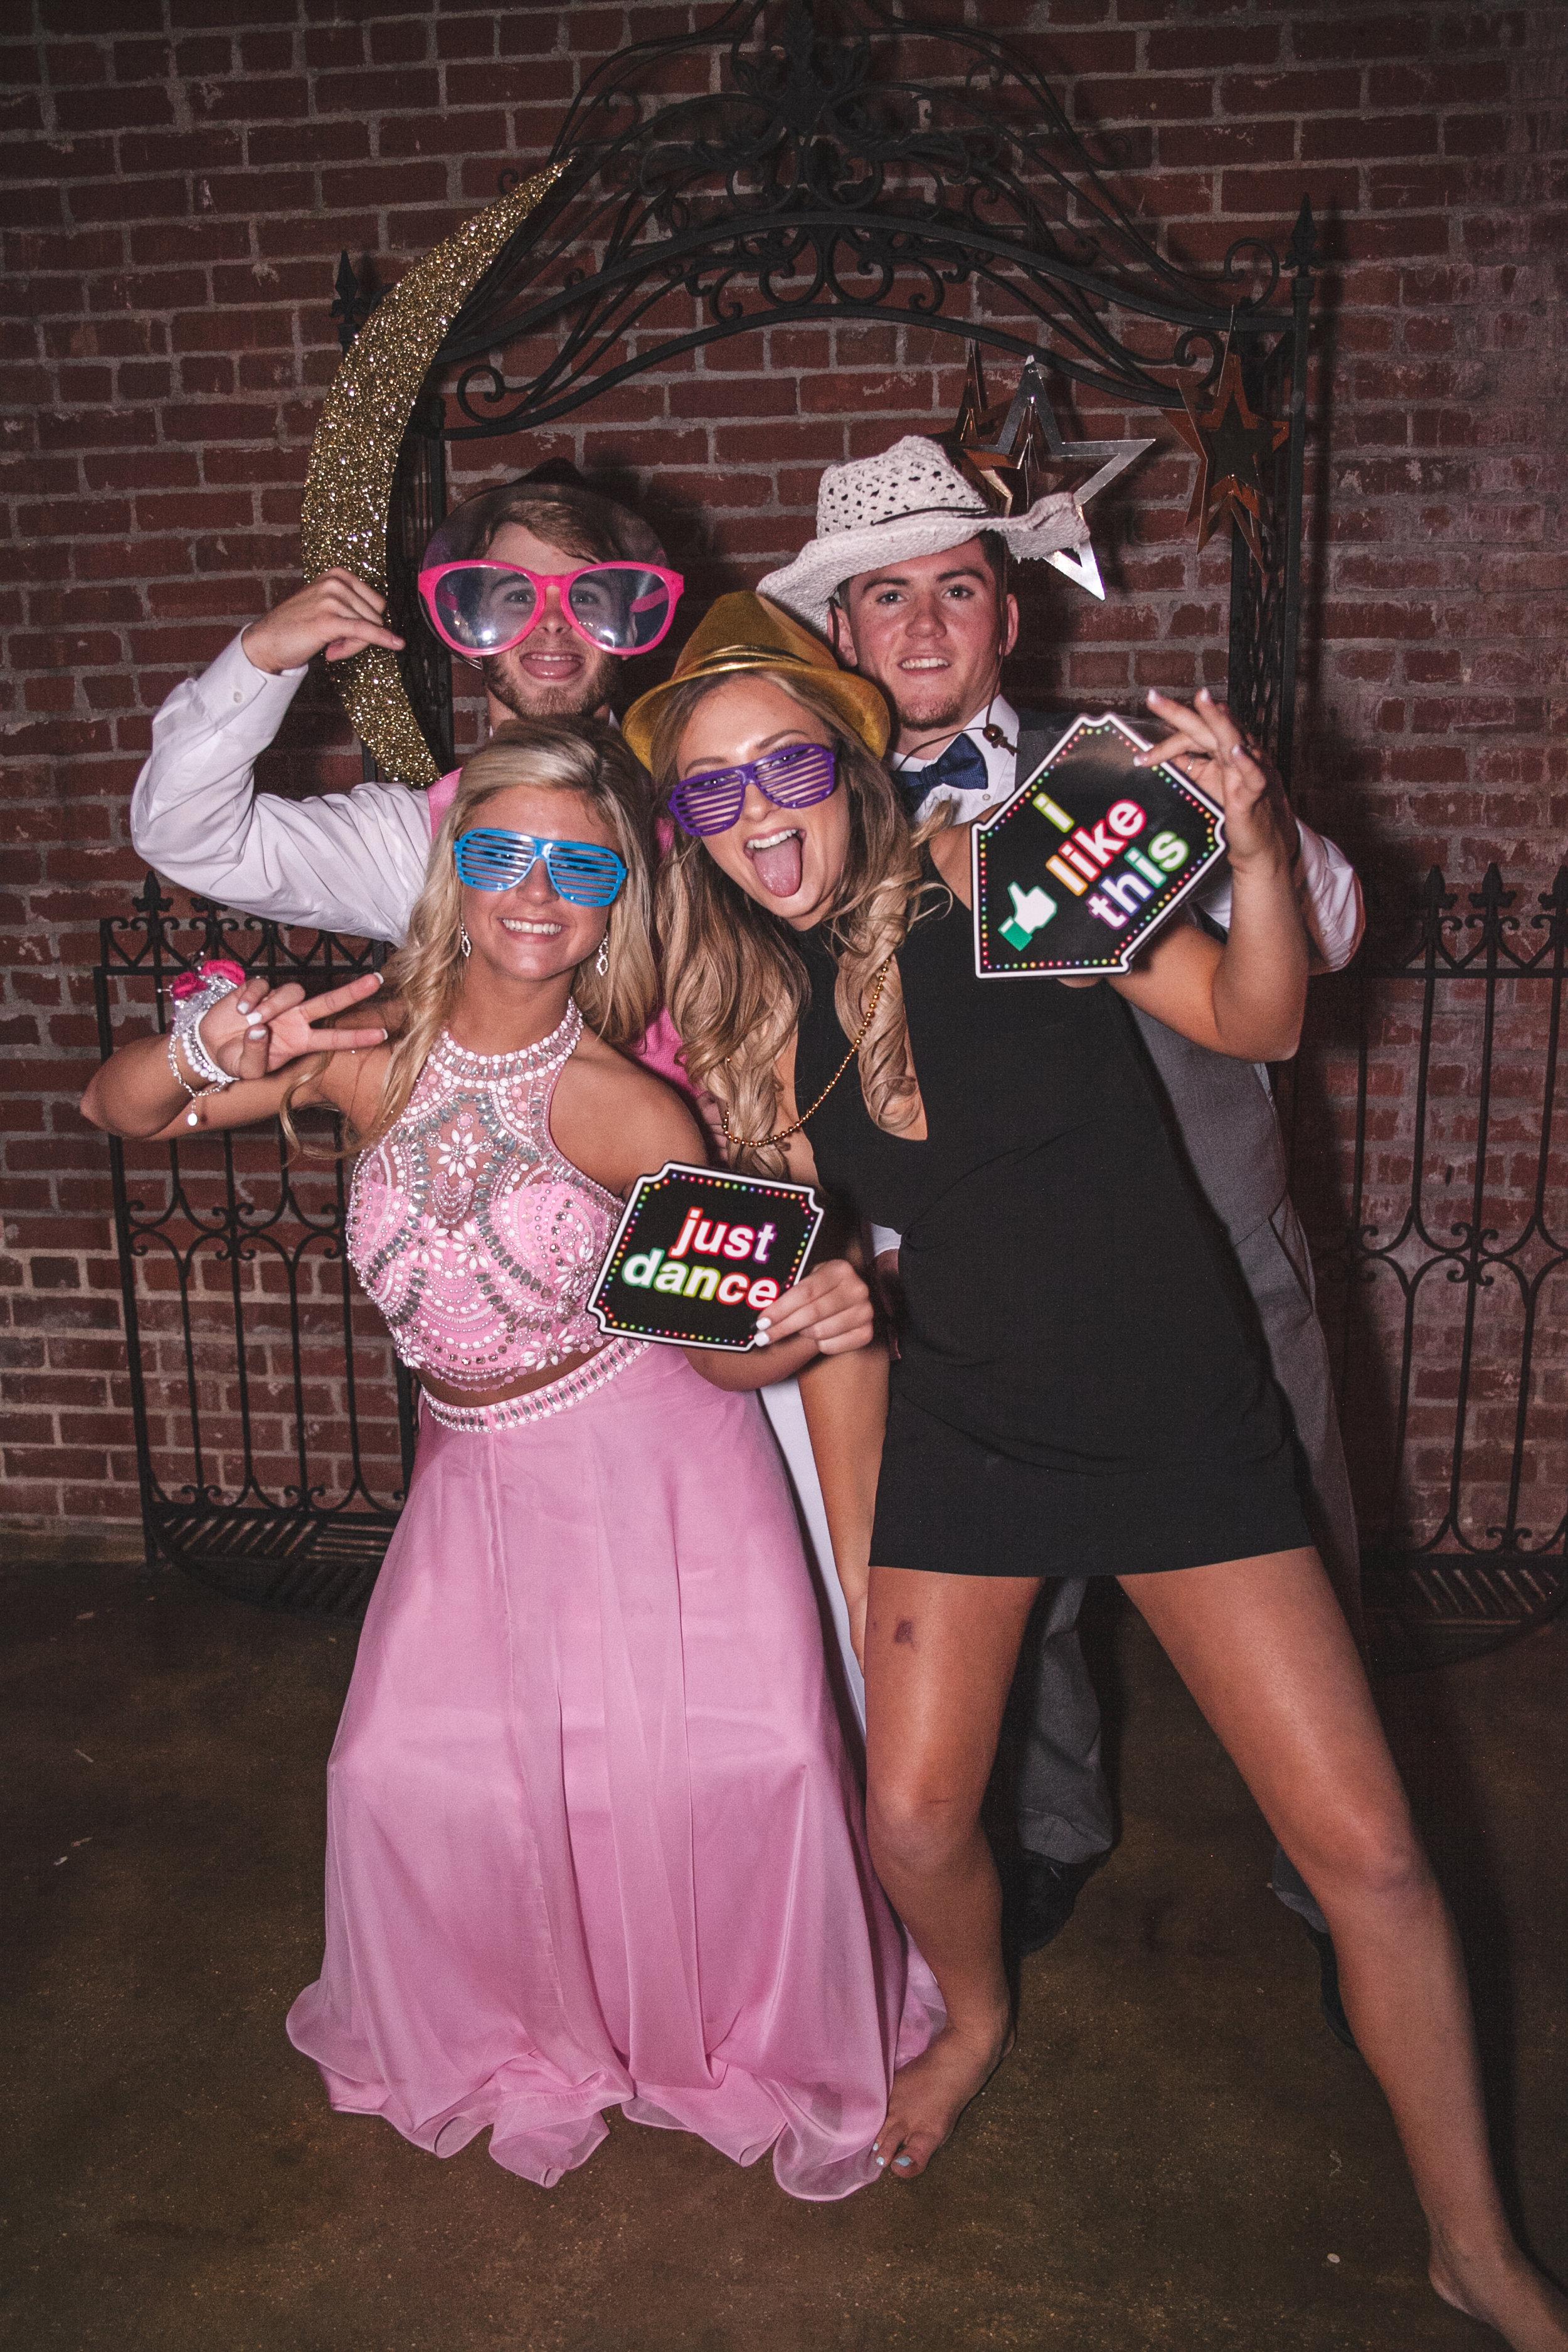 Nashville_Wedding_Photographers_DJ_Lighting_Bowling_Franklin (79 of 137).jpg